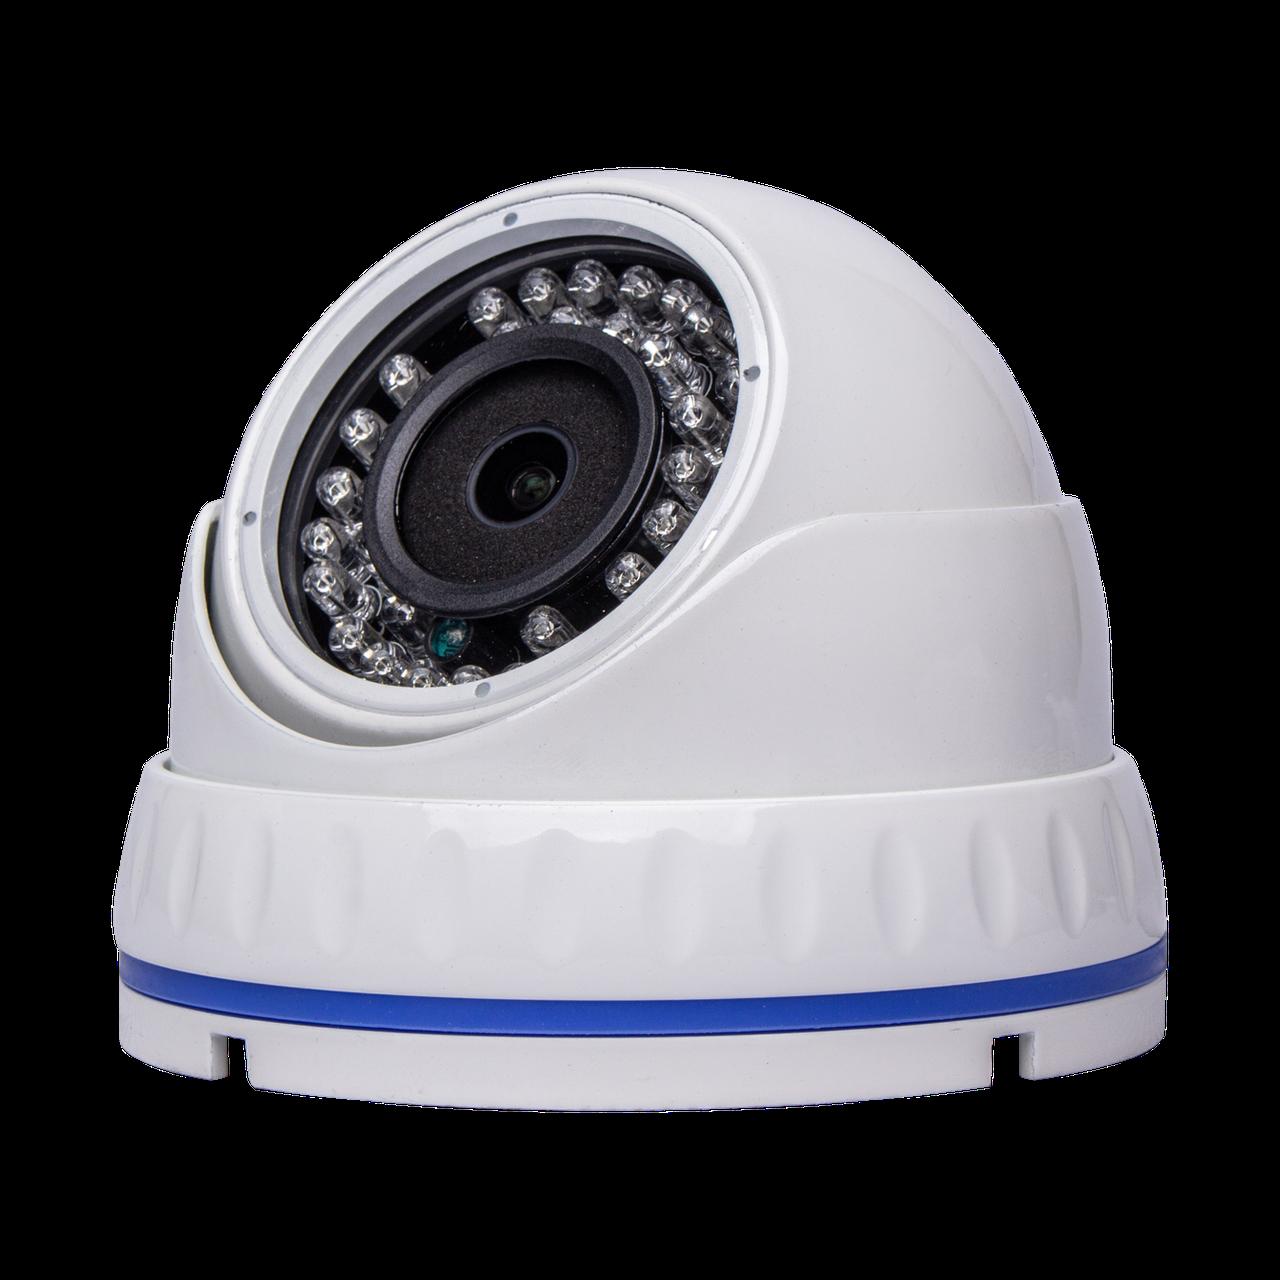 Антивандальная IP камера Green Vision GV-105-IP-X-DOS50-20 POE 5MP